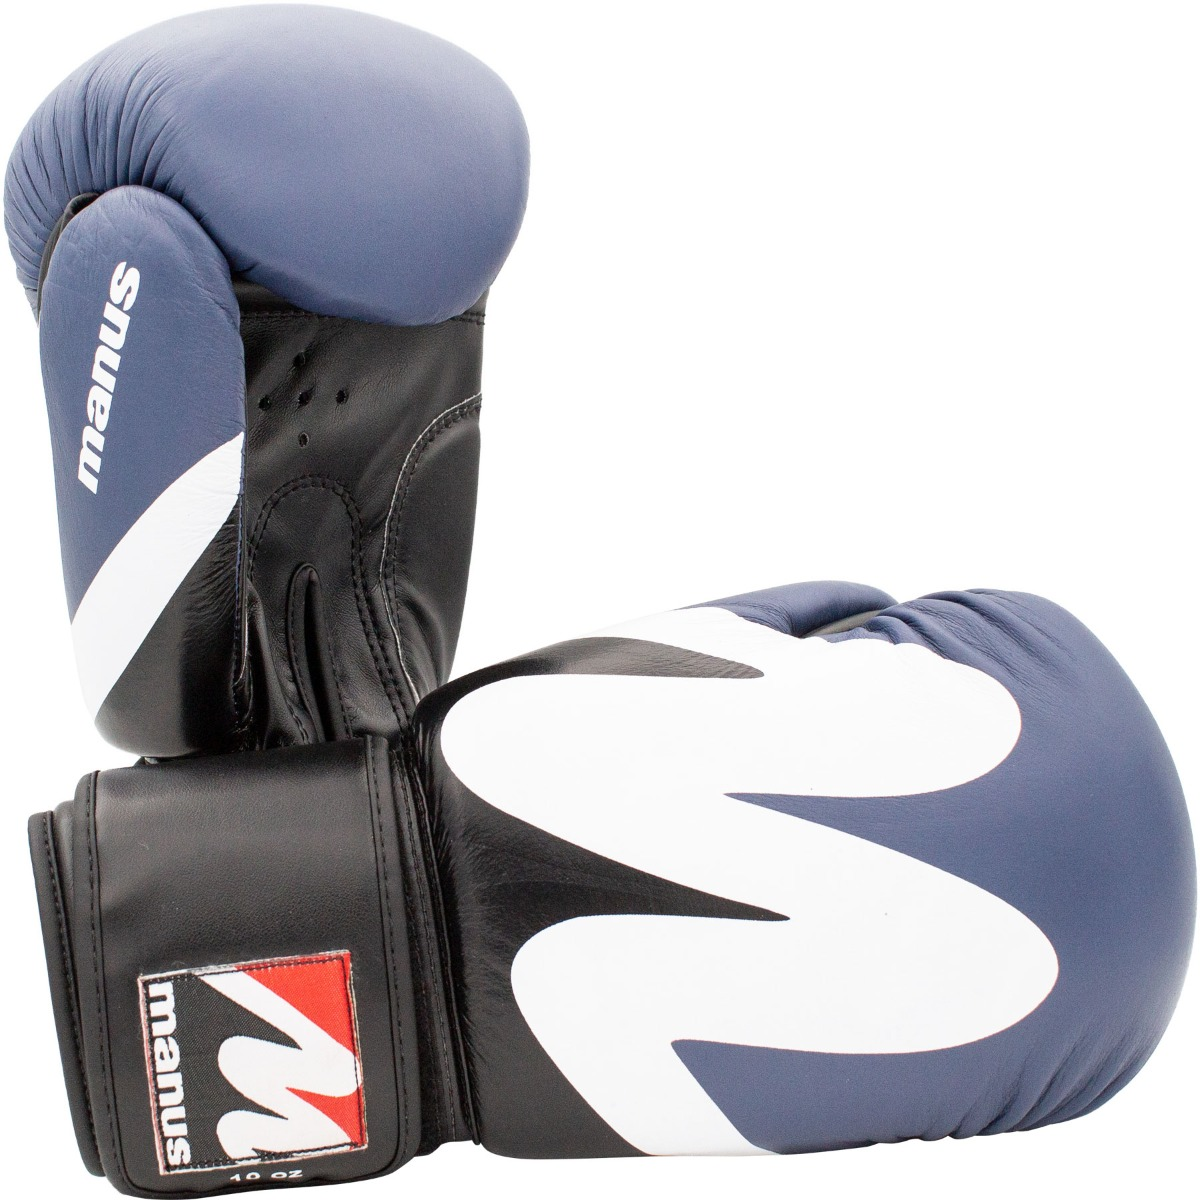 Boxhandschuh Manus 2019 Leder Schwarz-Grau